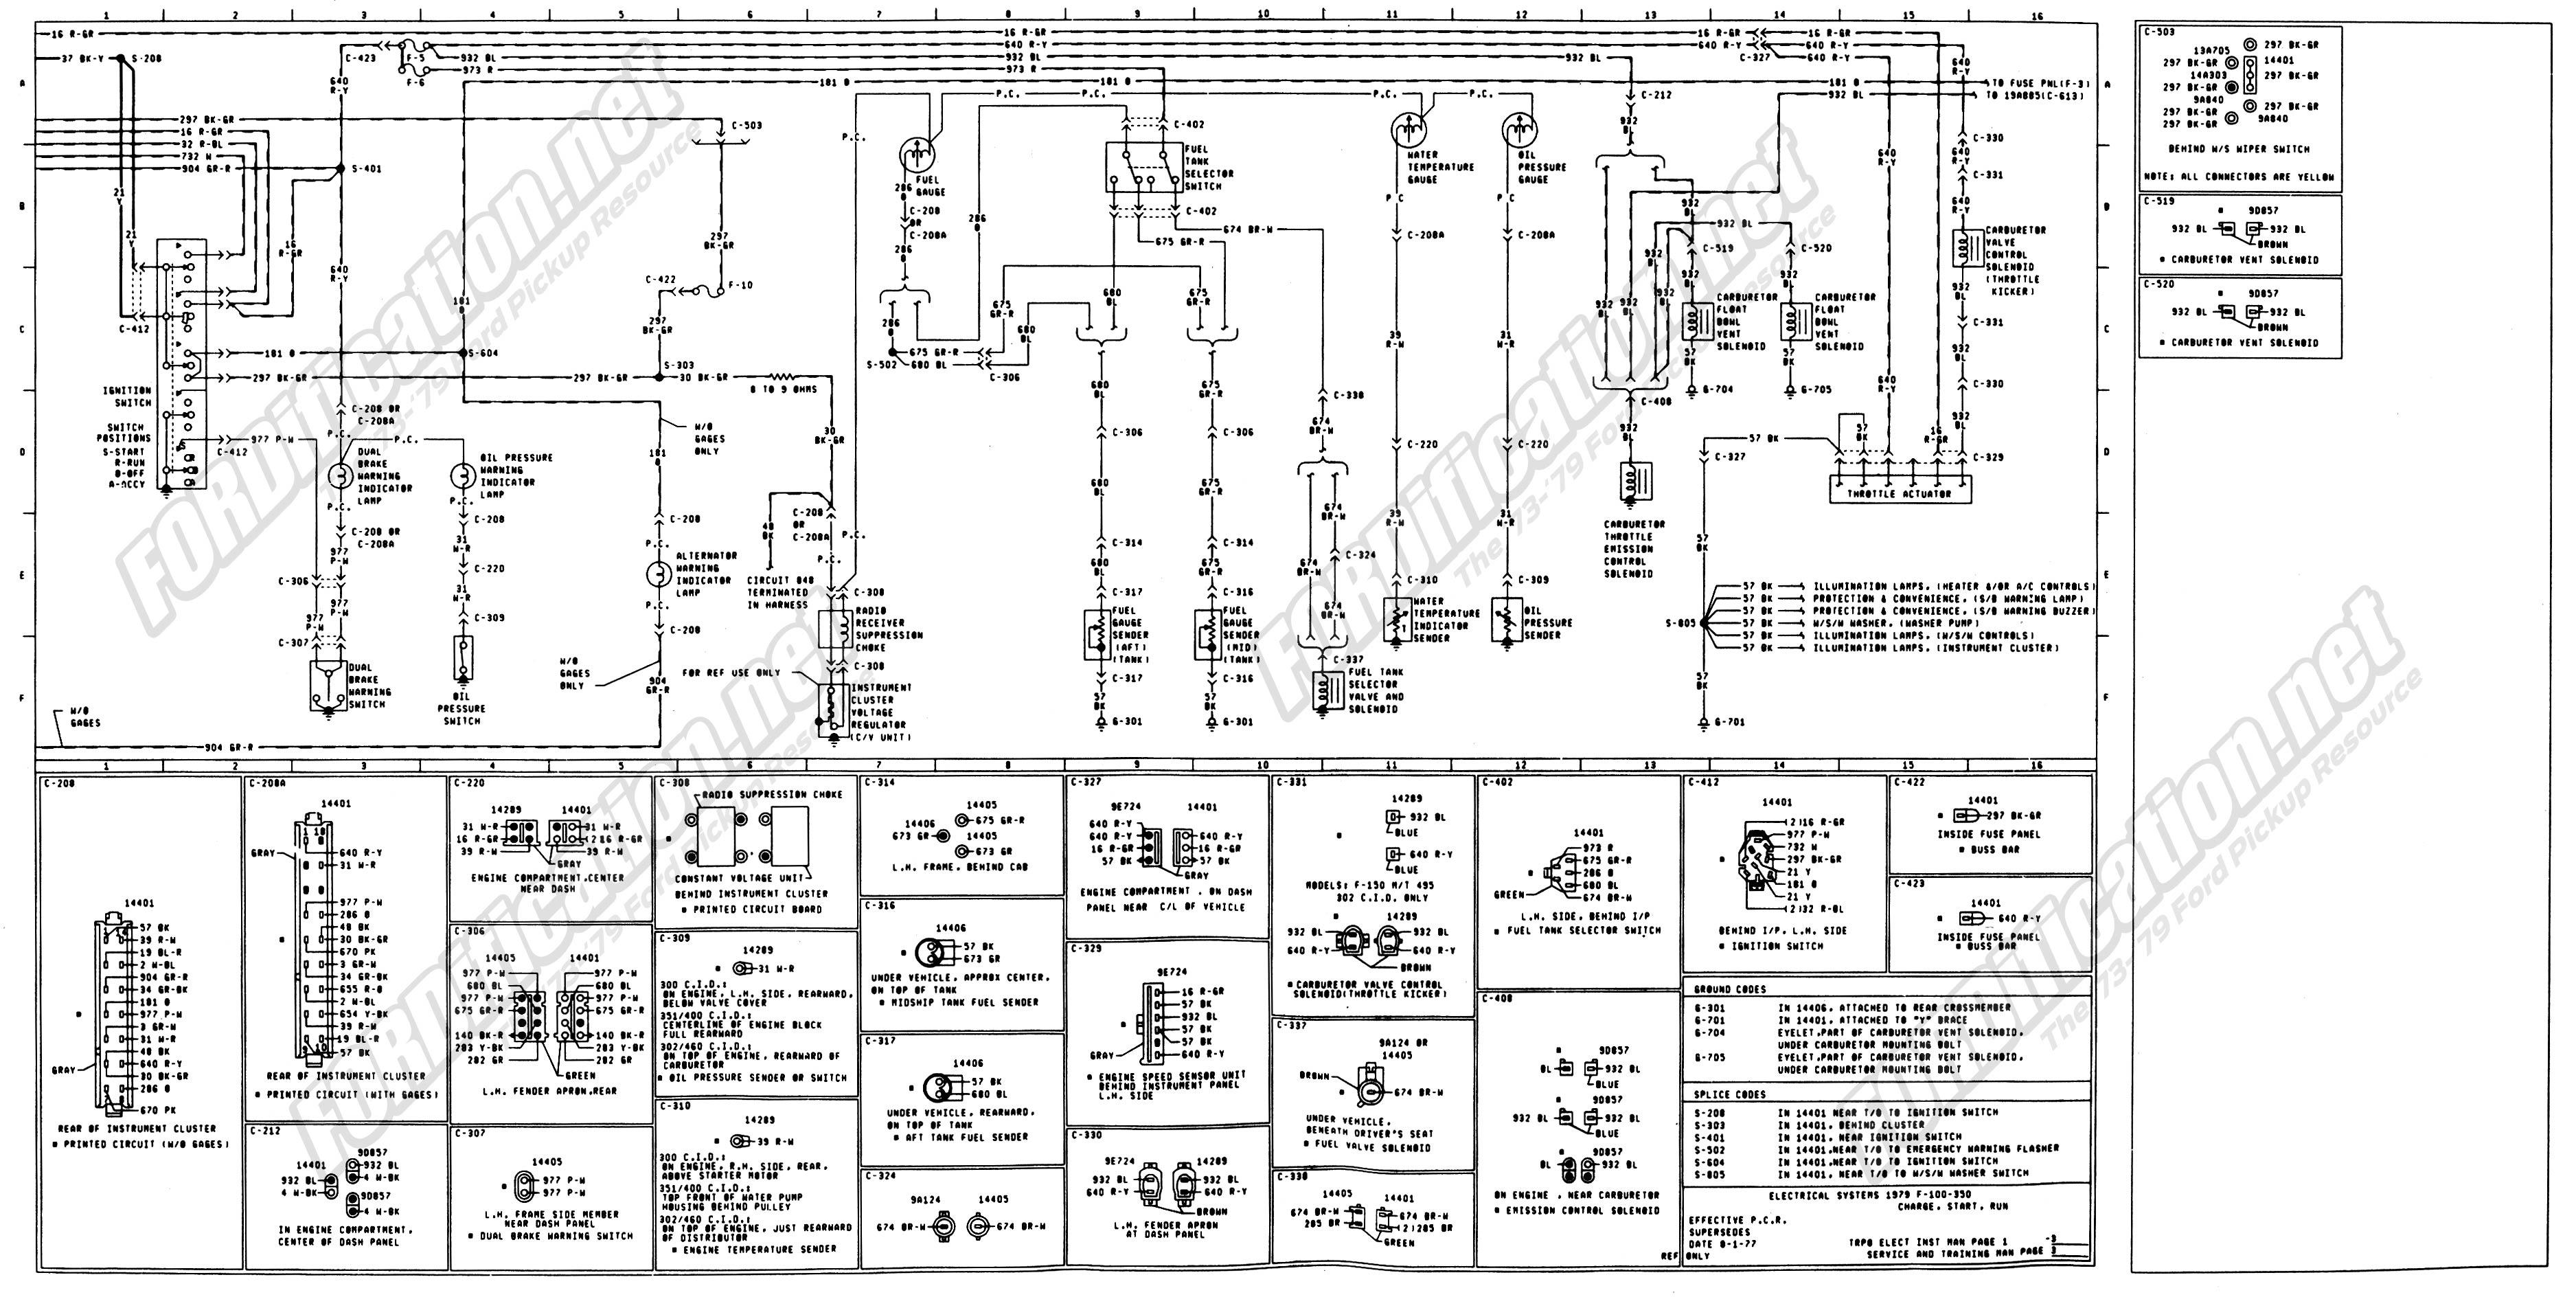 [DIAGRAM] 5 Wire Alternator Wiring Diagram 08 6 6 FULL